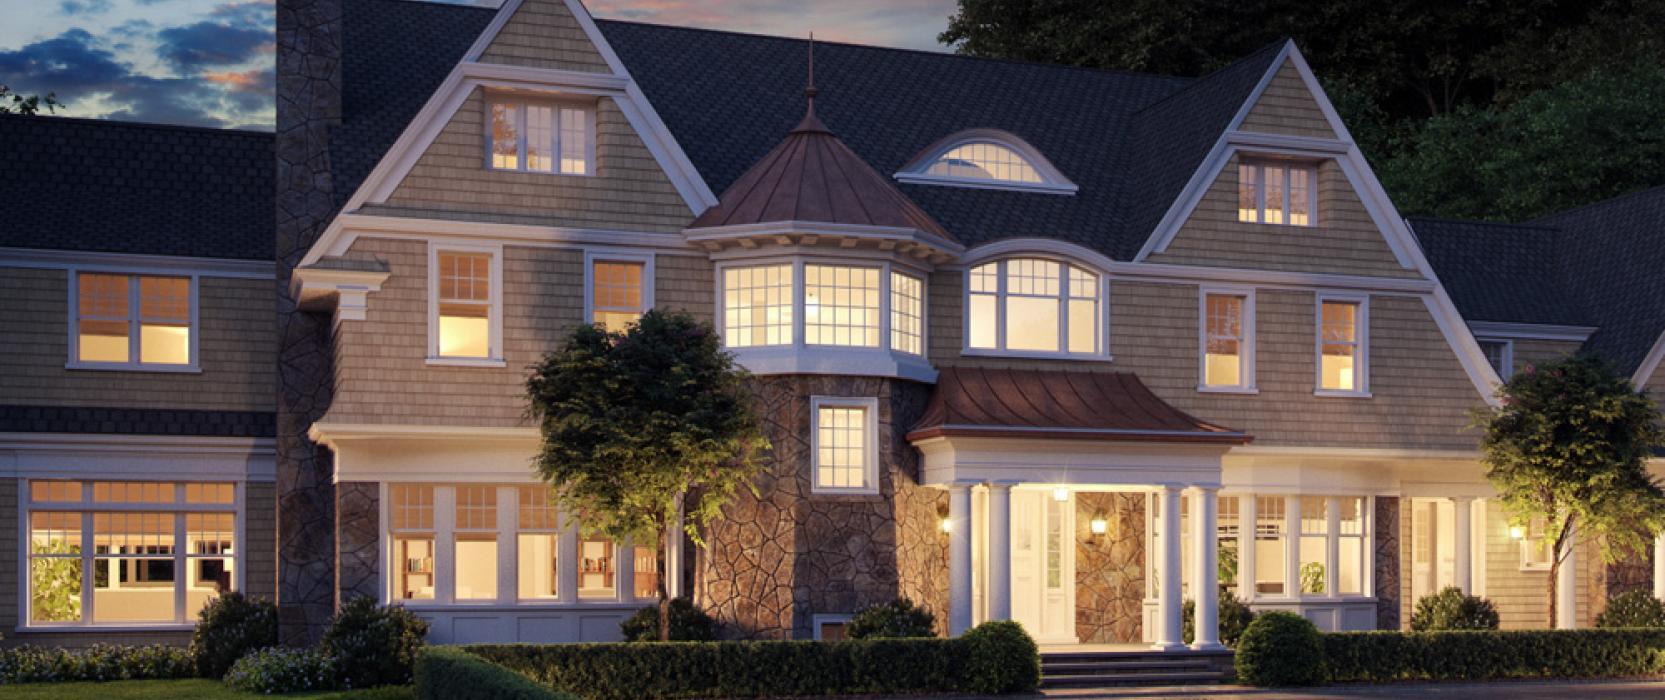 8.6-Million Home by Sanford Custom Builders, Jan Gleysteen & The MacDowell Company